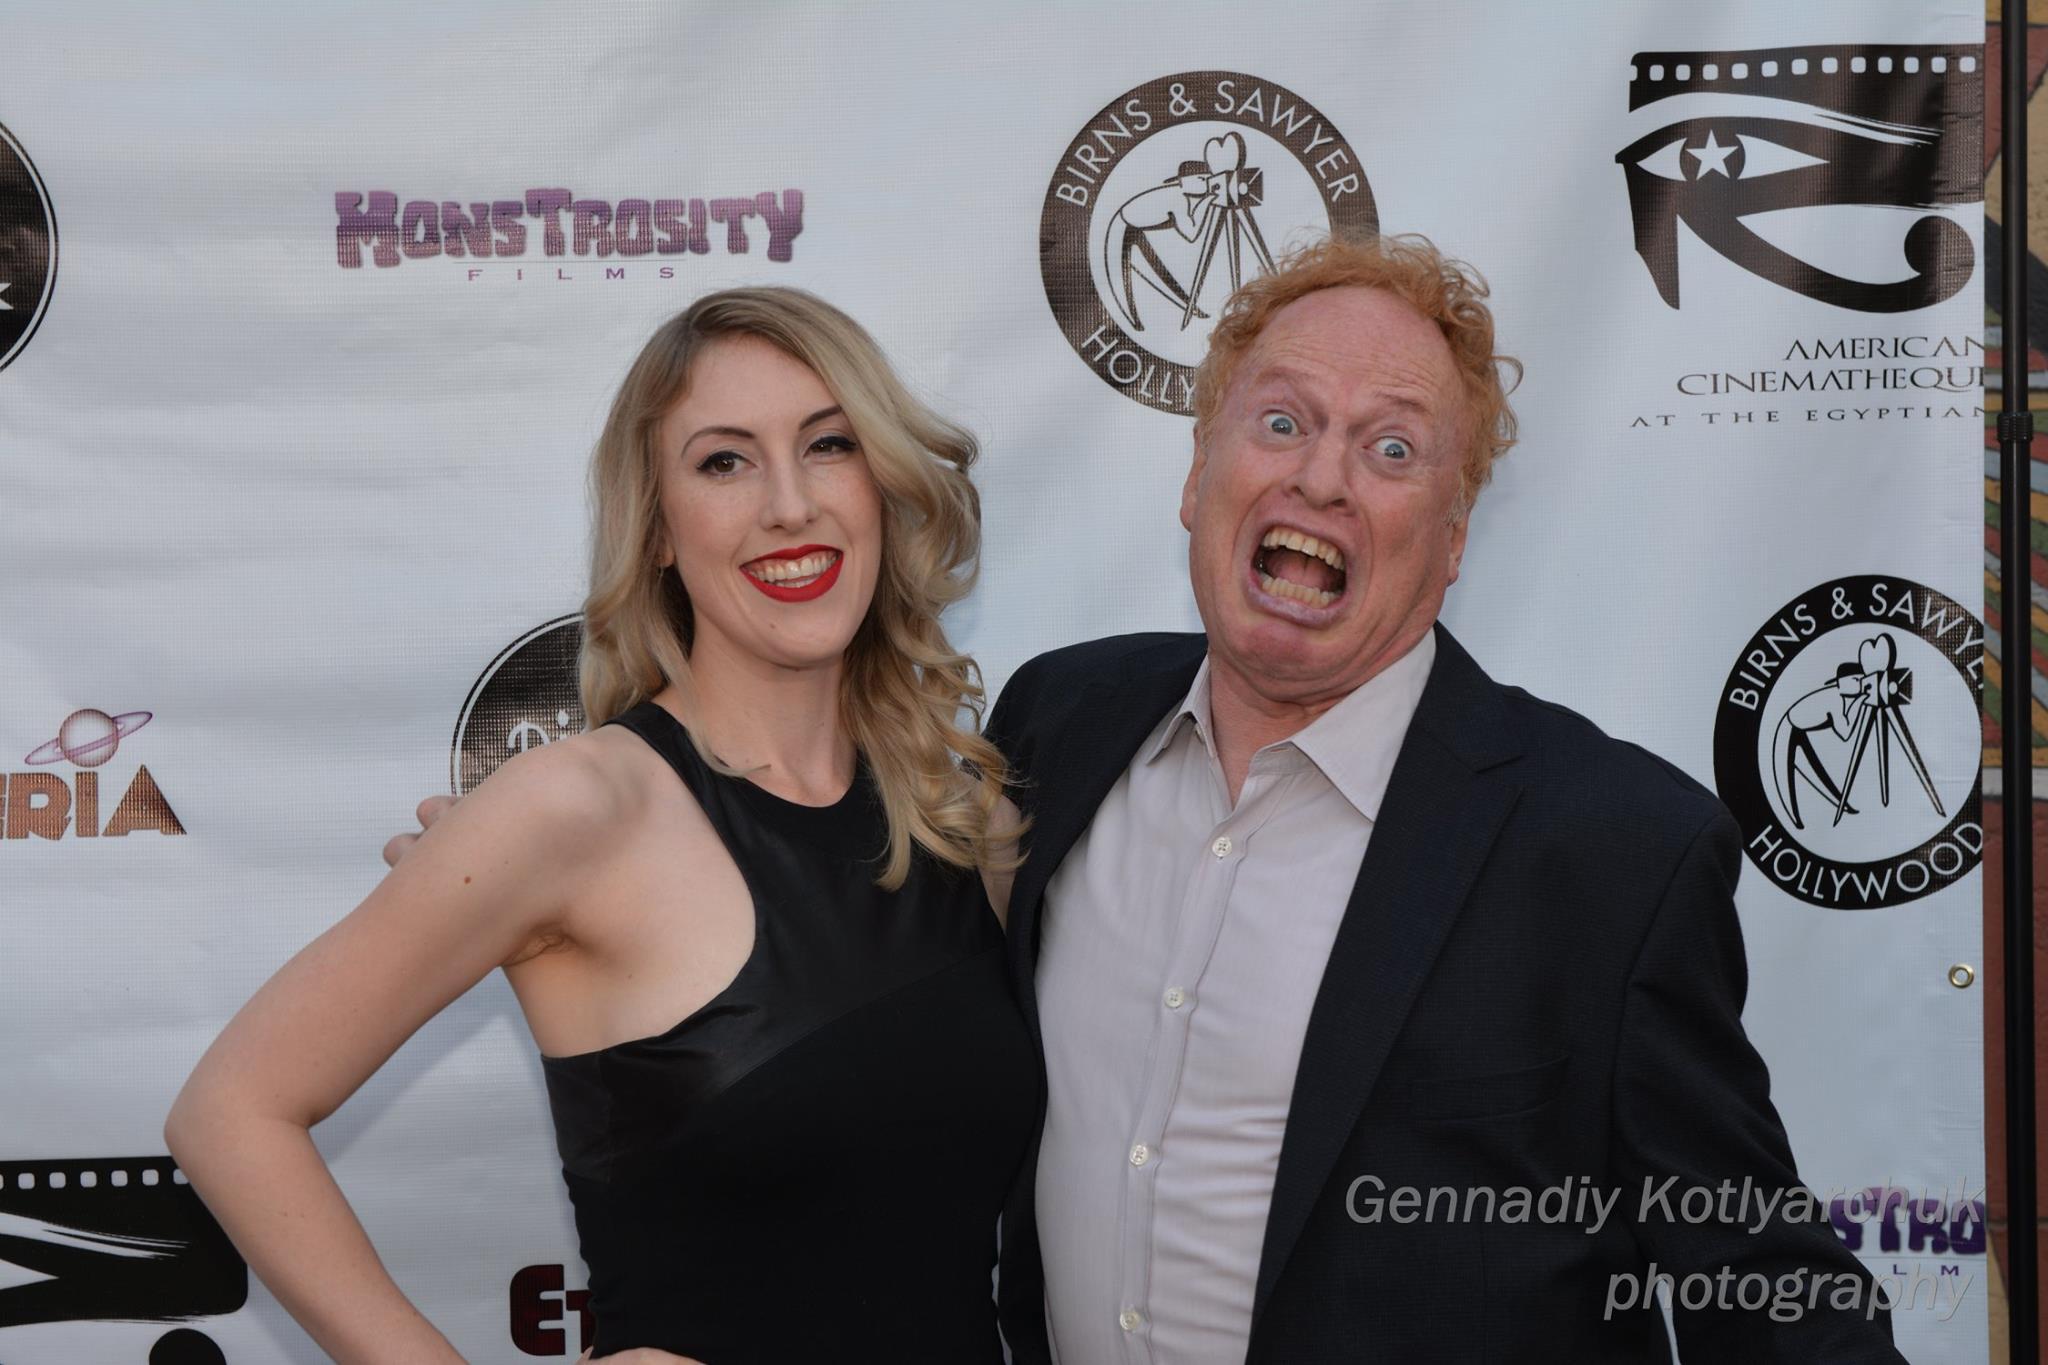 Richard and Anastasia Elfman at Etheria Film Night 2015